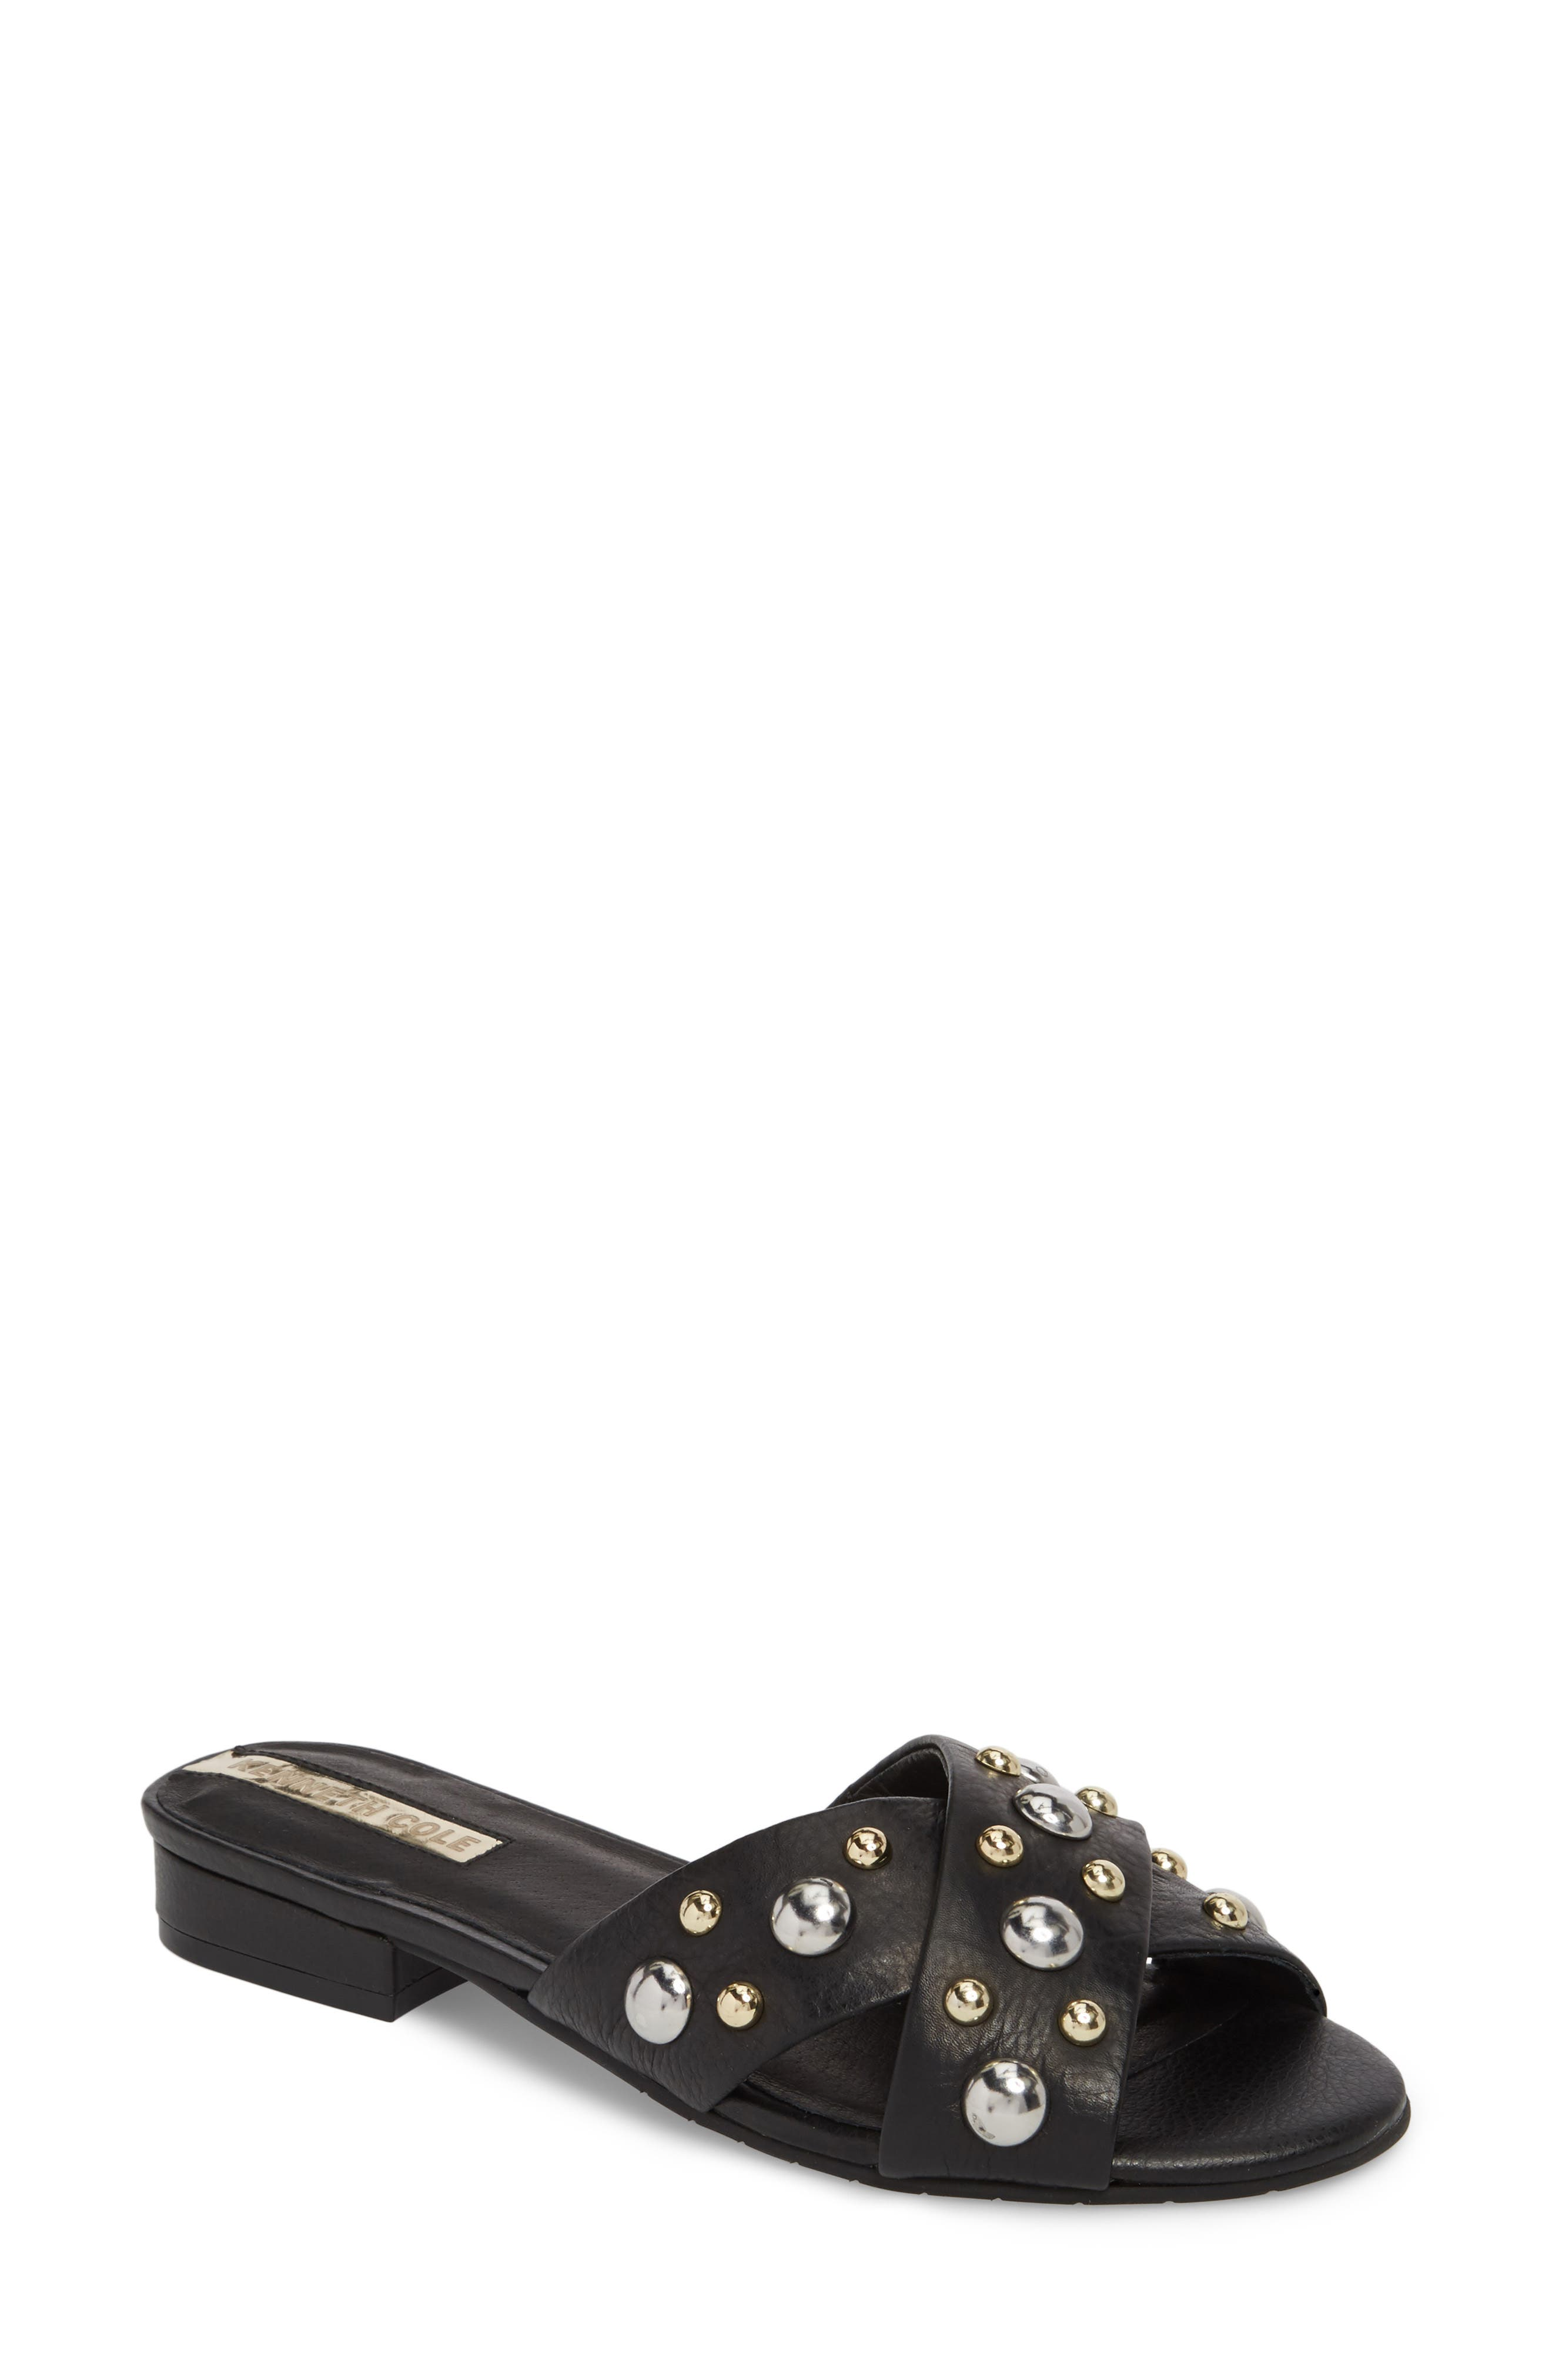 Verna Studded Slide Sandal,                         Main,                         color,